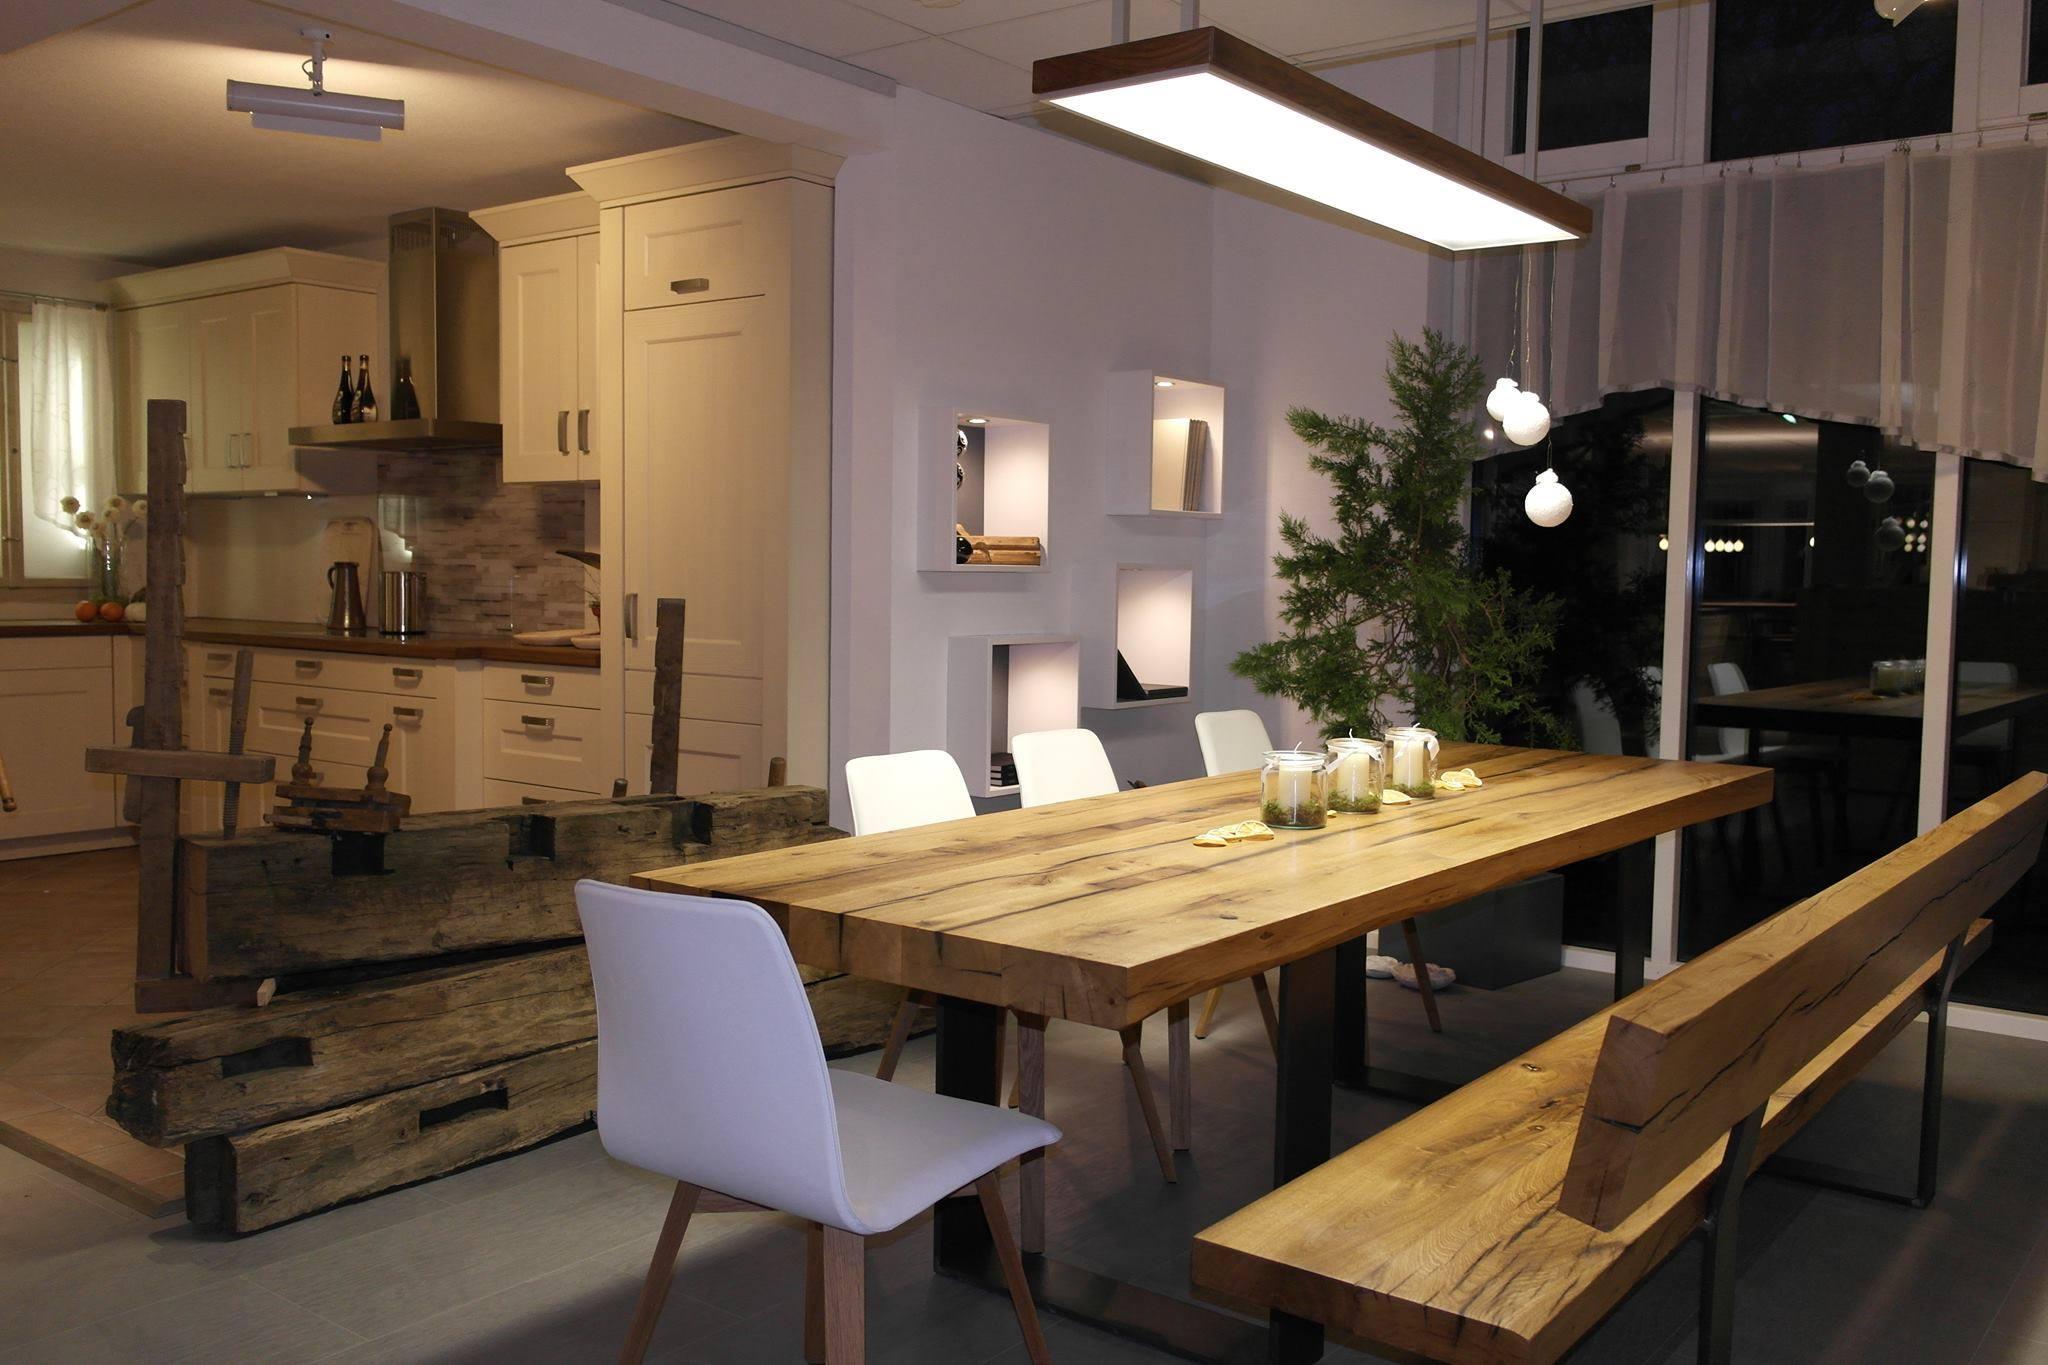 Schreinerei braig in allmendingen bei ulm for Table salle a manger en bois massif